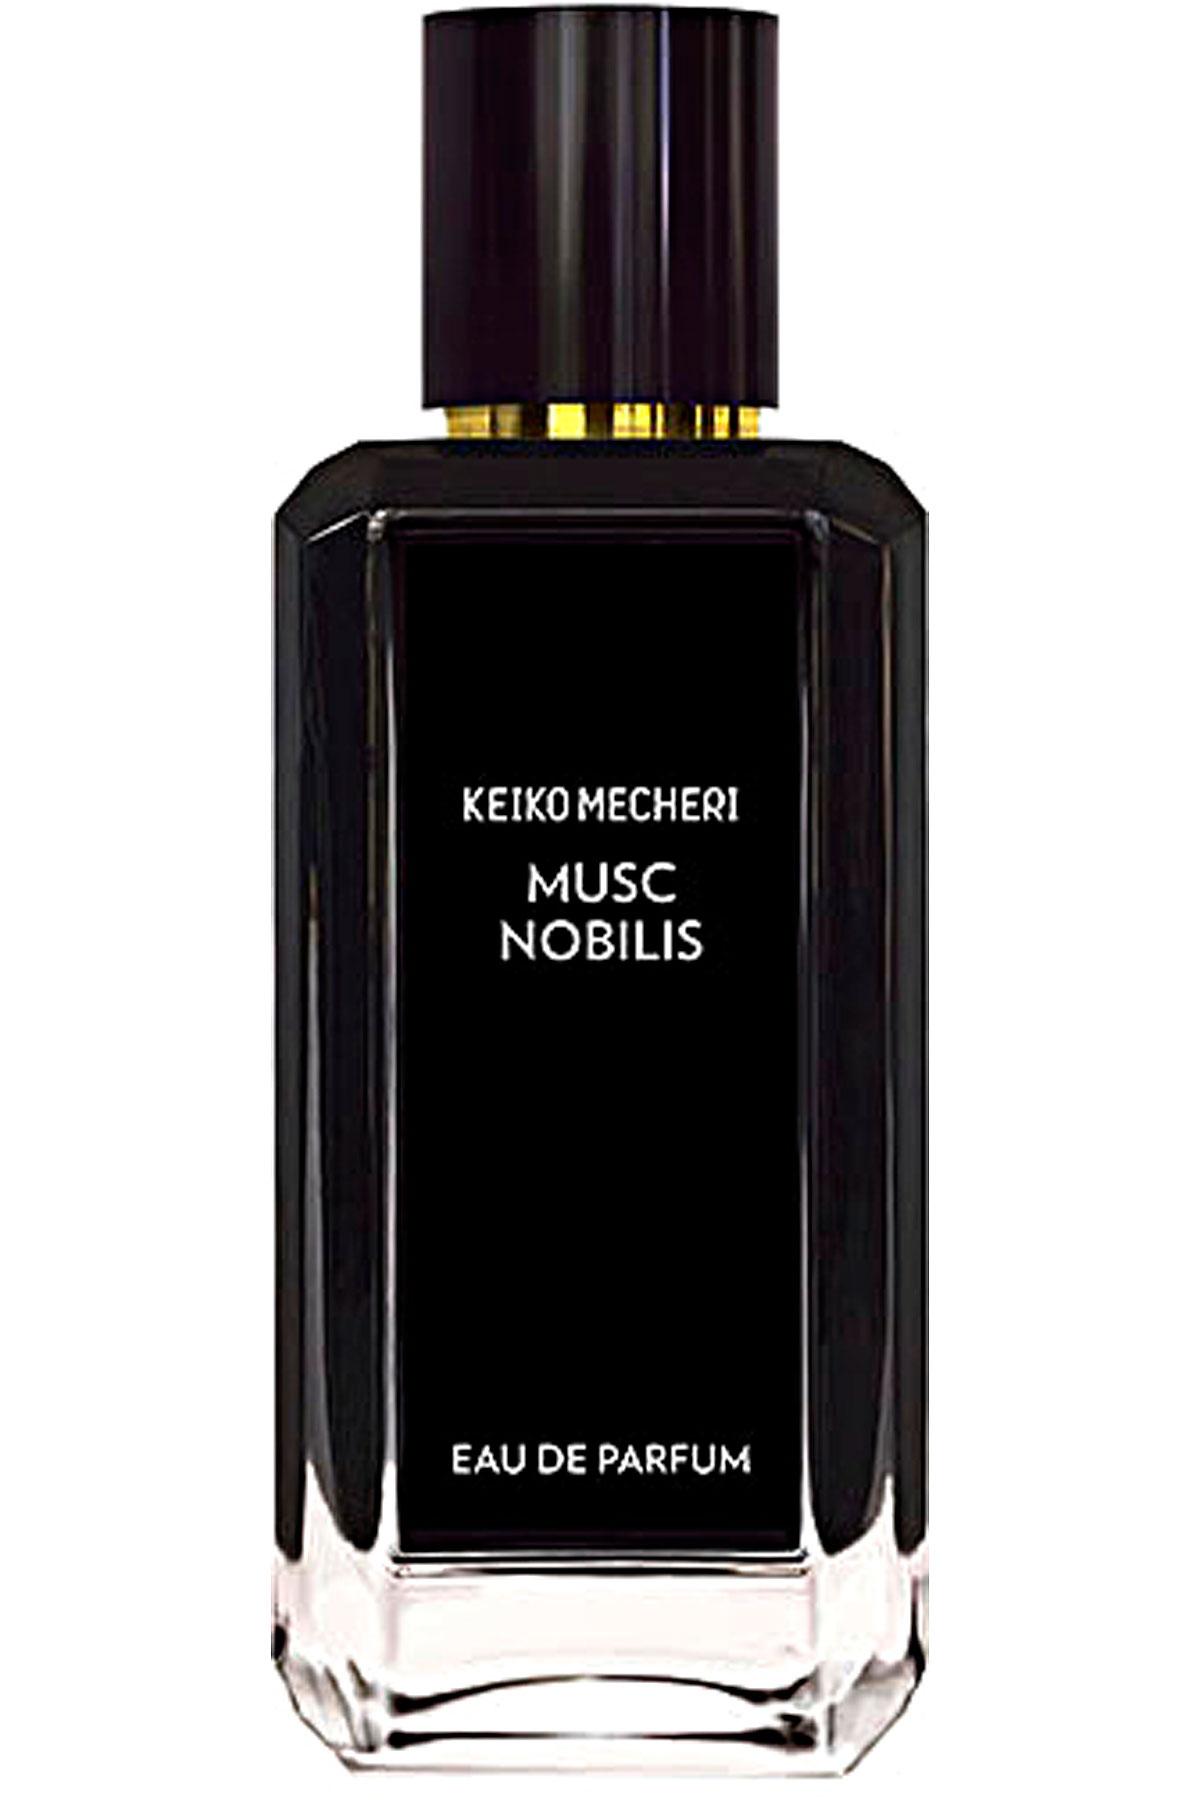 Keiko Mecheri Fragrances for Men, Musc Nobilis - Eau De Parfum - 100 Ml, 2019, 100 ml